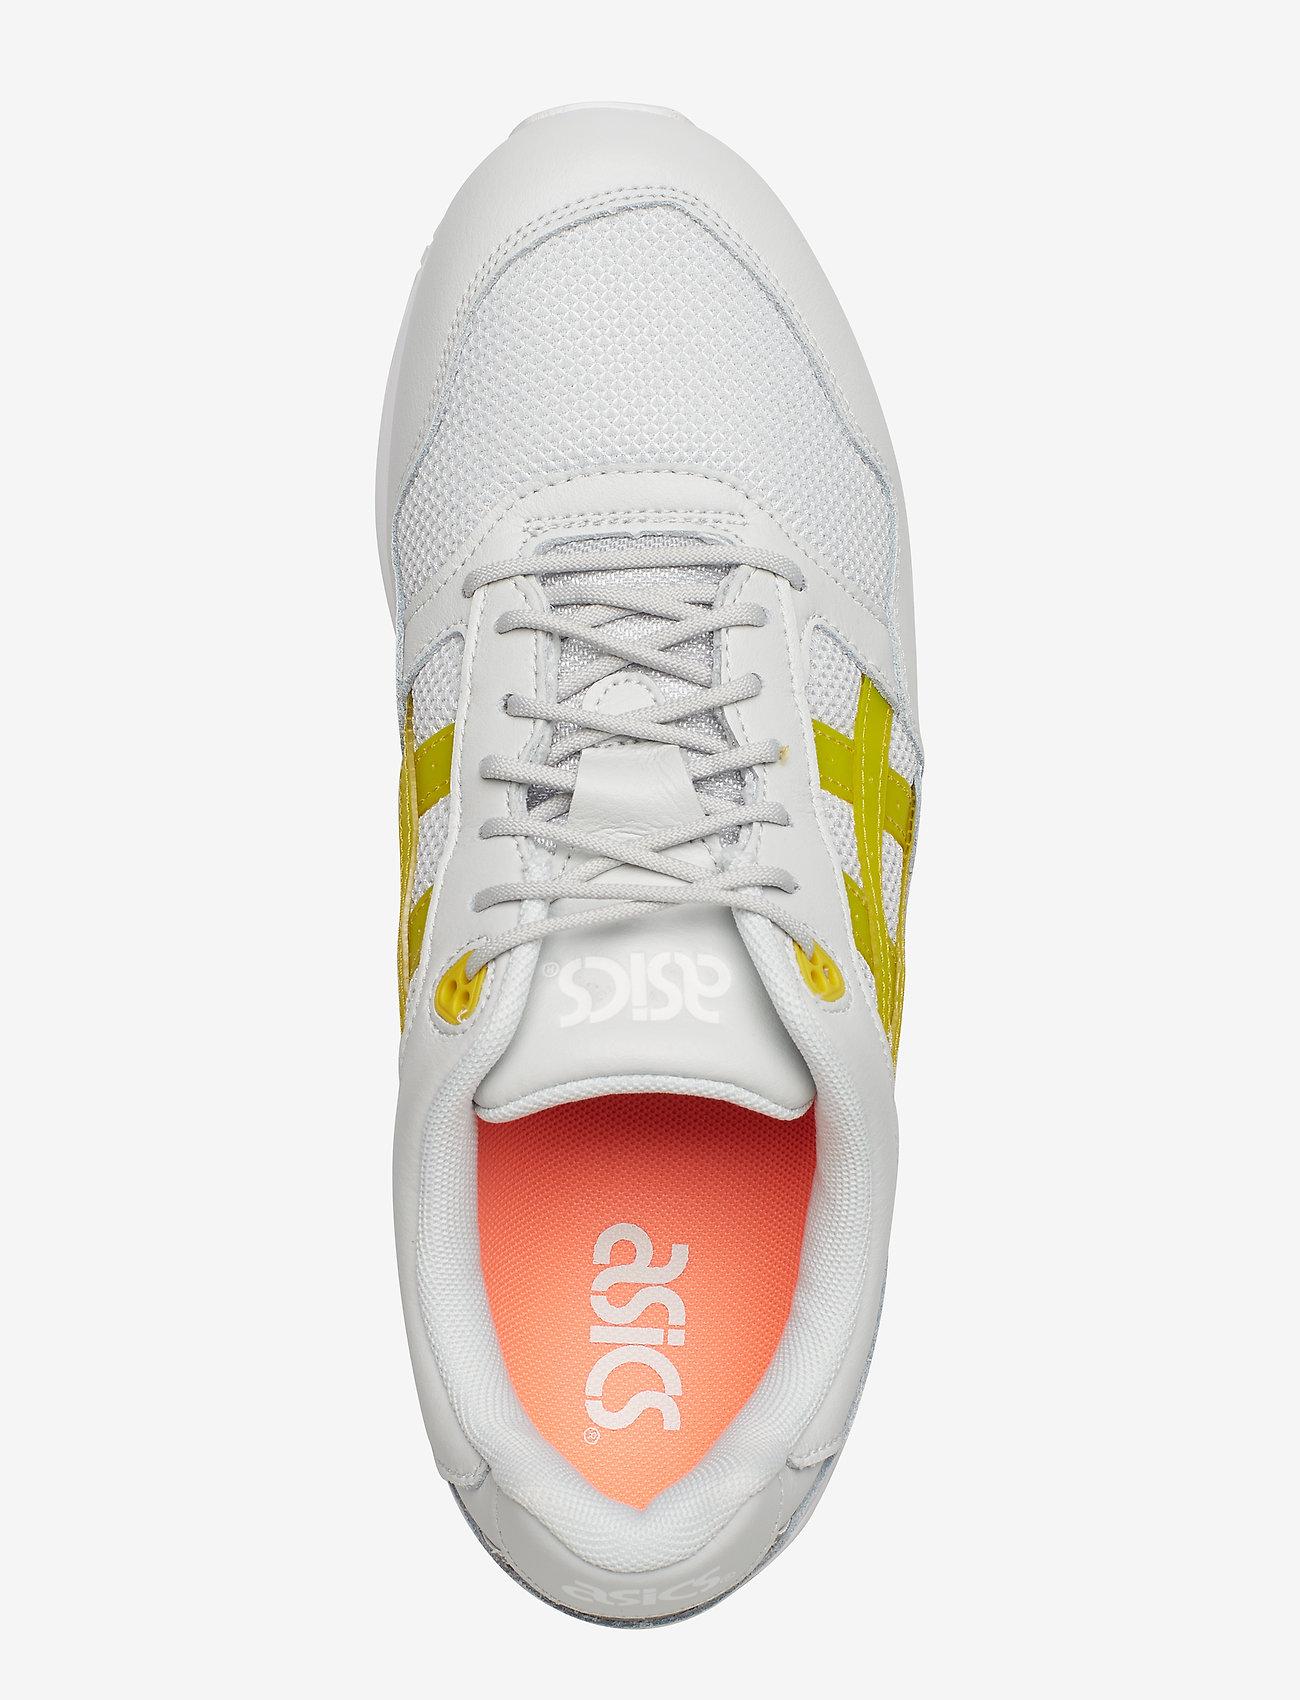 Gelsaga (Glacier Grey/mustard) - ASICS SportStyle